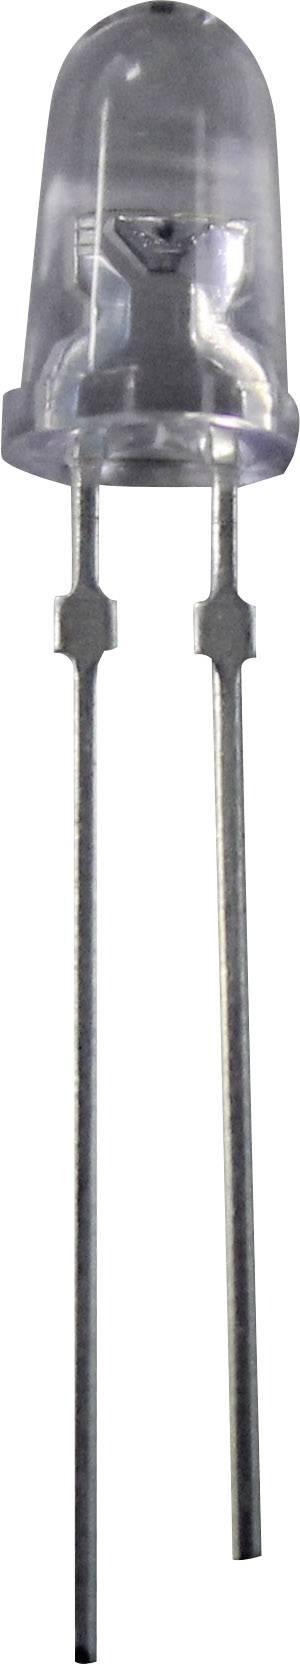 LED dioda kulatá s vývody Nichia, 20 mA, 3 mm, 3,2 V, 30 °, 9600 mcd, zelená, NSPG310A